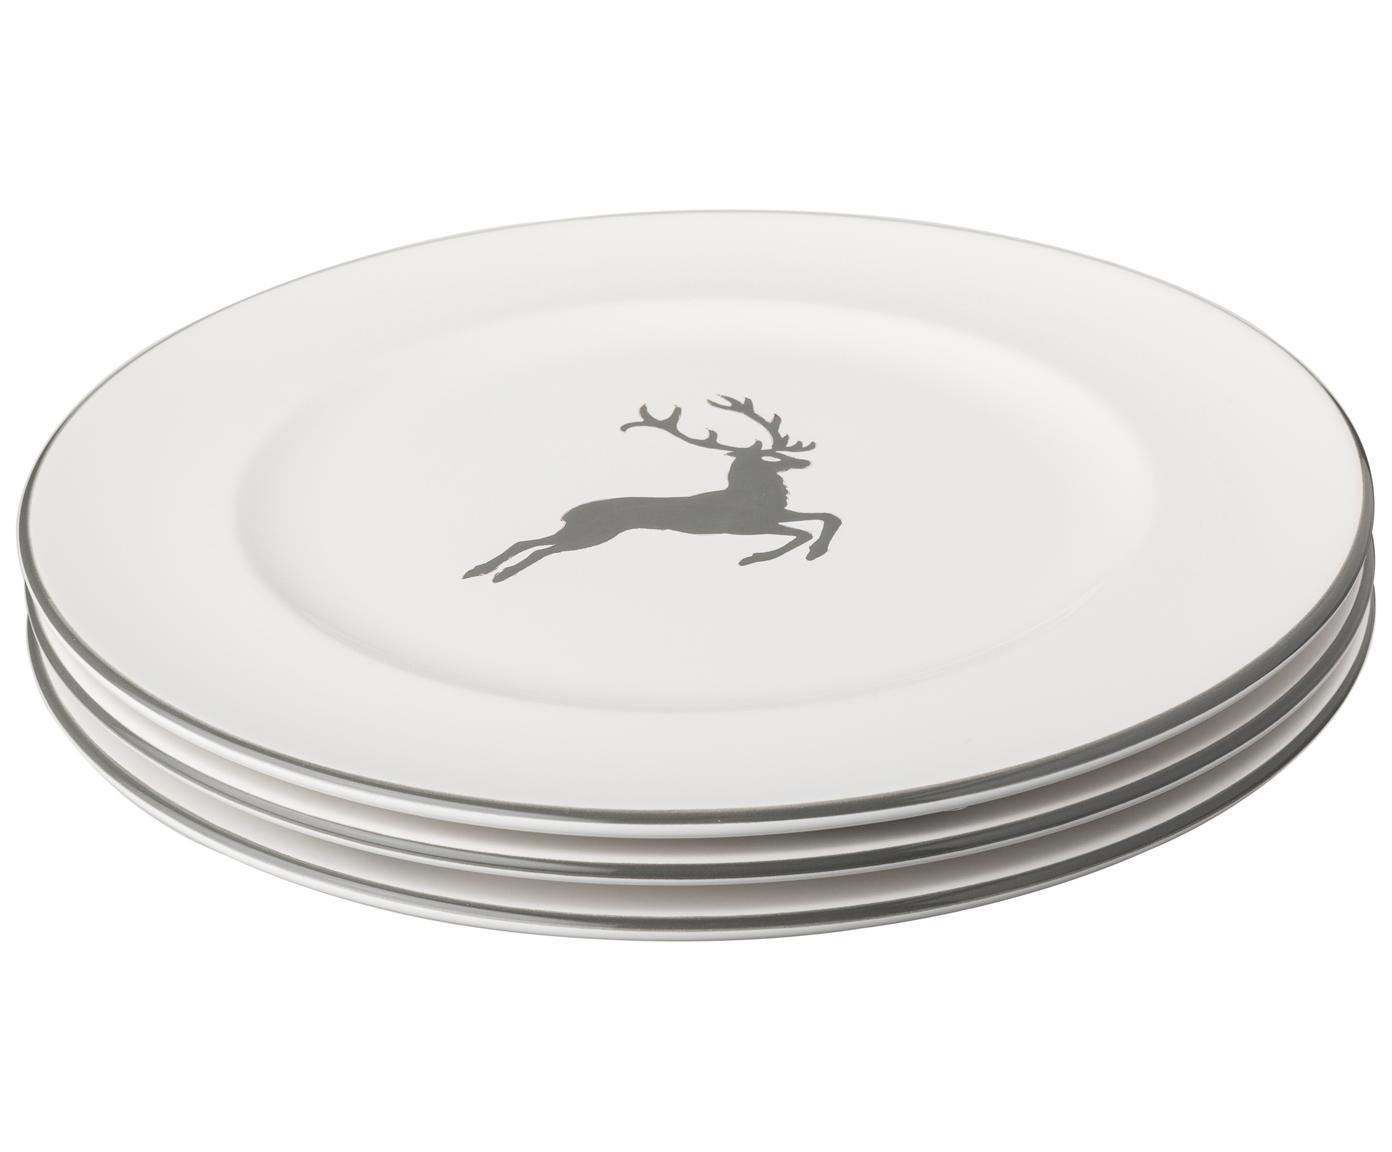 Piatto piano Gourmet Grauer Hirsch, Ceramica, Grigio, bianco, Ø 27 cm